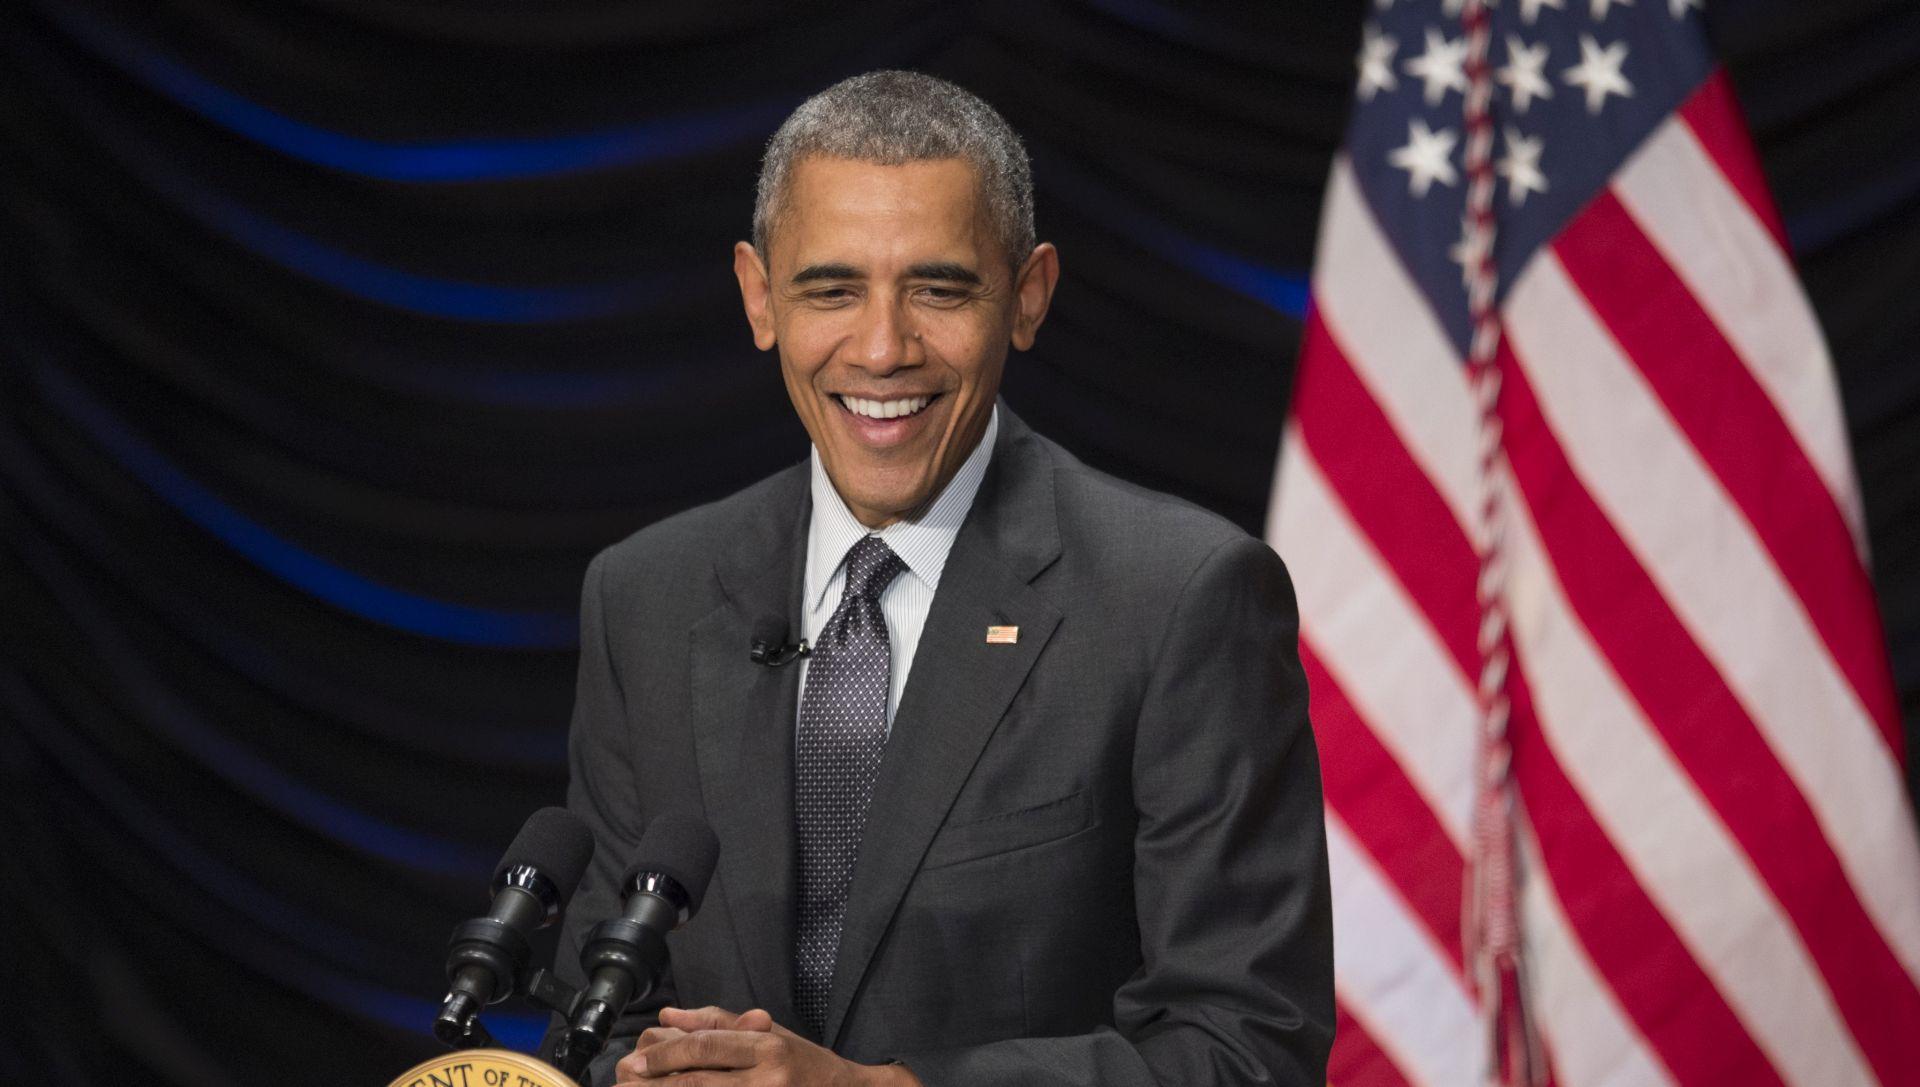 Obama i Hollande za ambiciozni i trajni sporazum o klimi